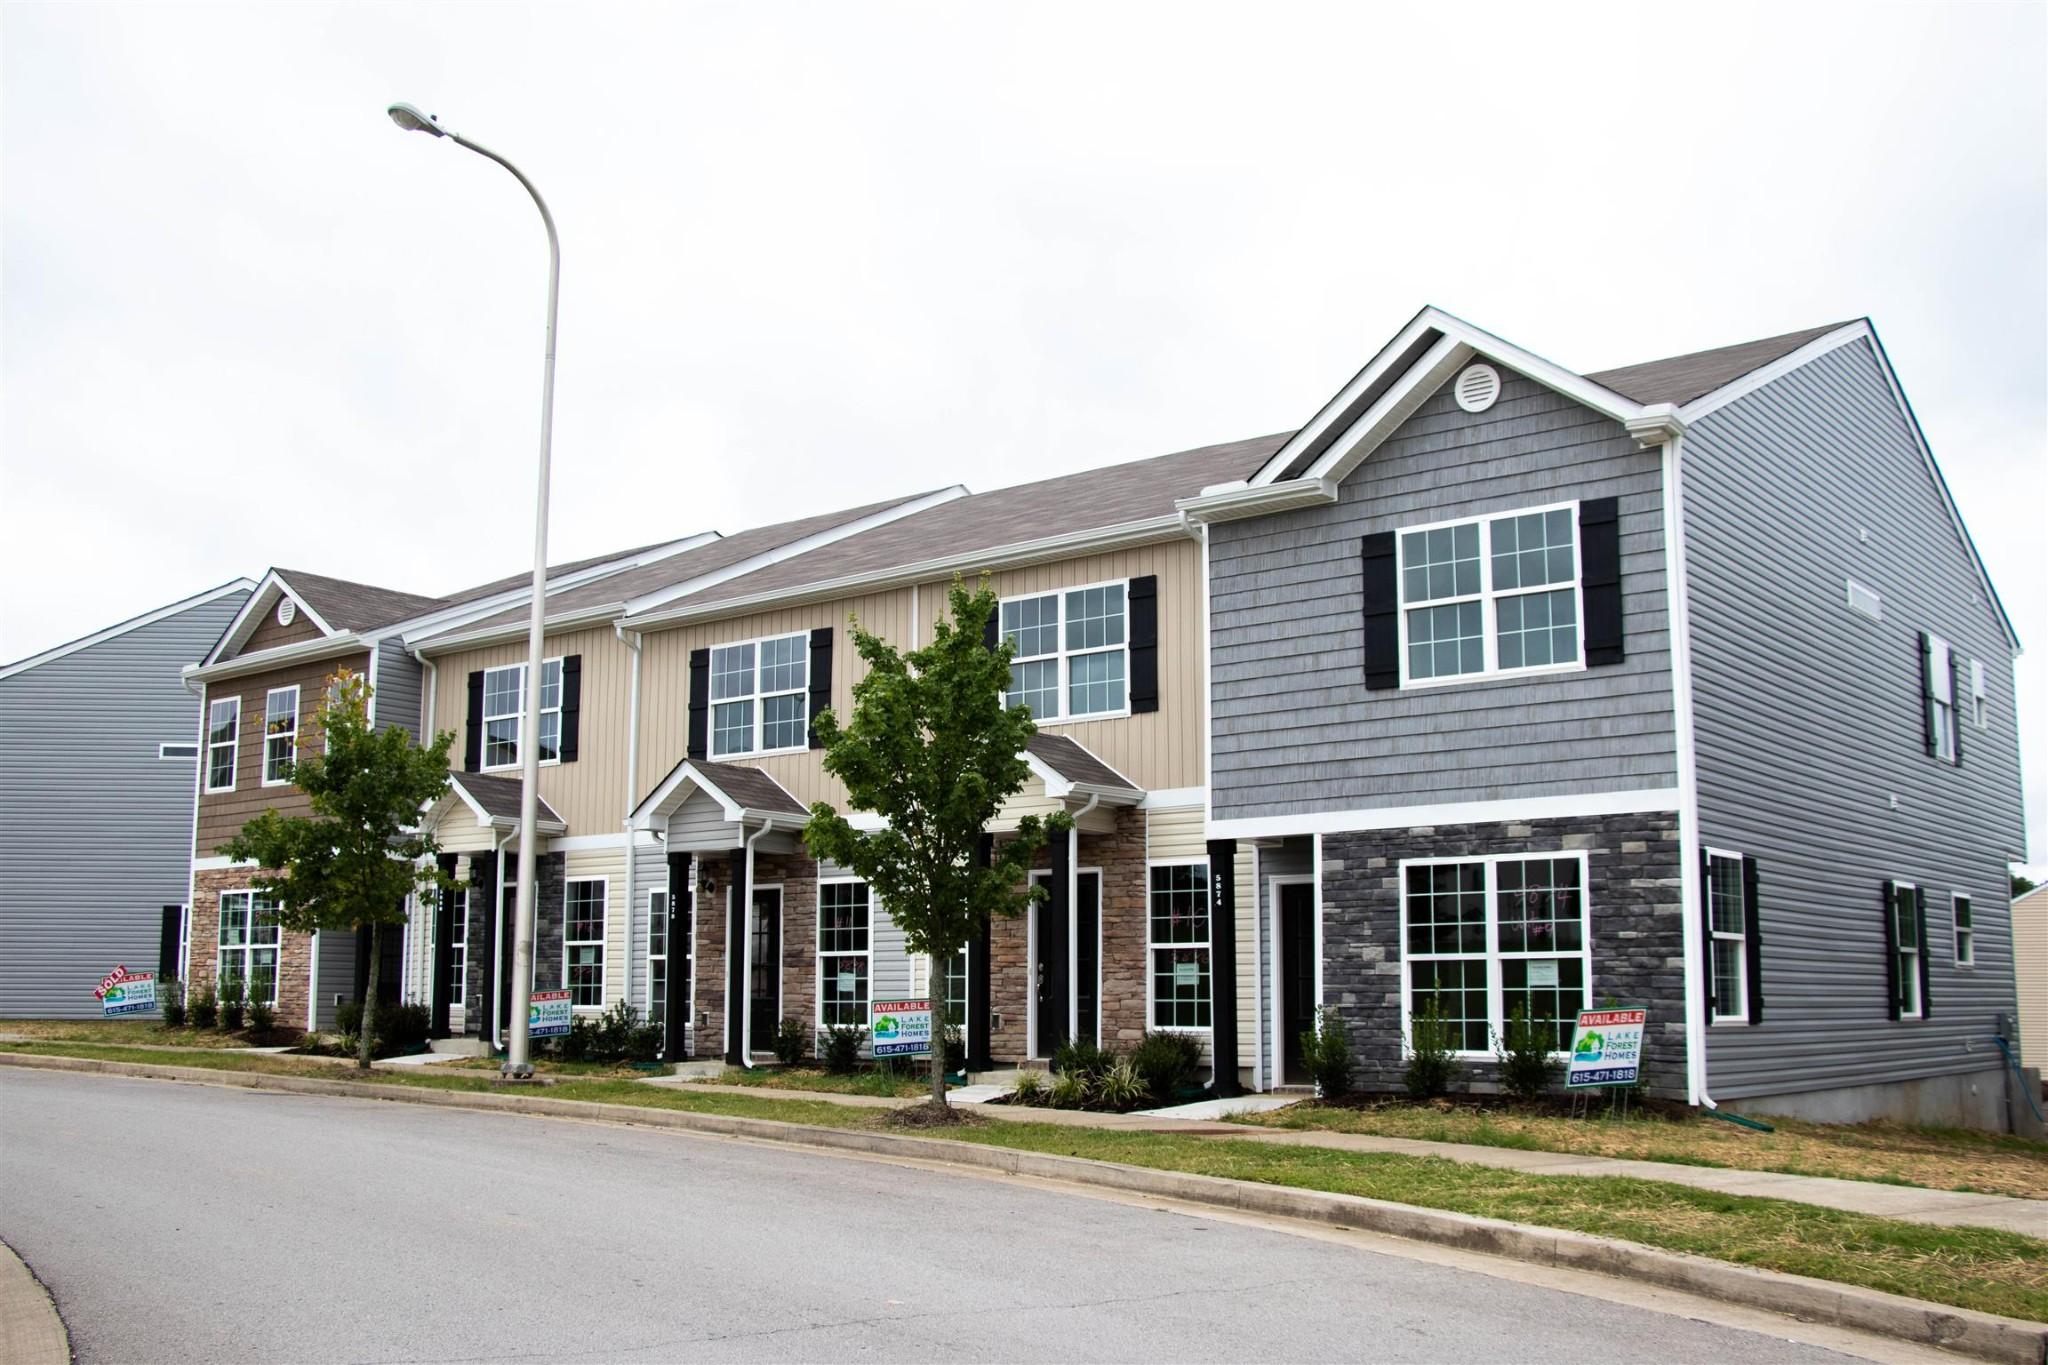 5888 Monroe XING, Antioch, TN 37013 - Antioch, TN real estate listing